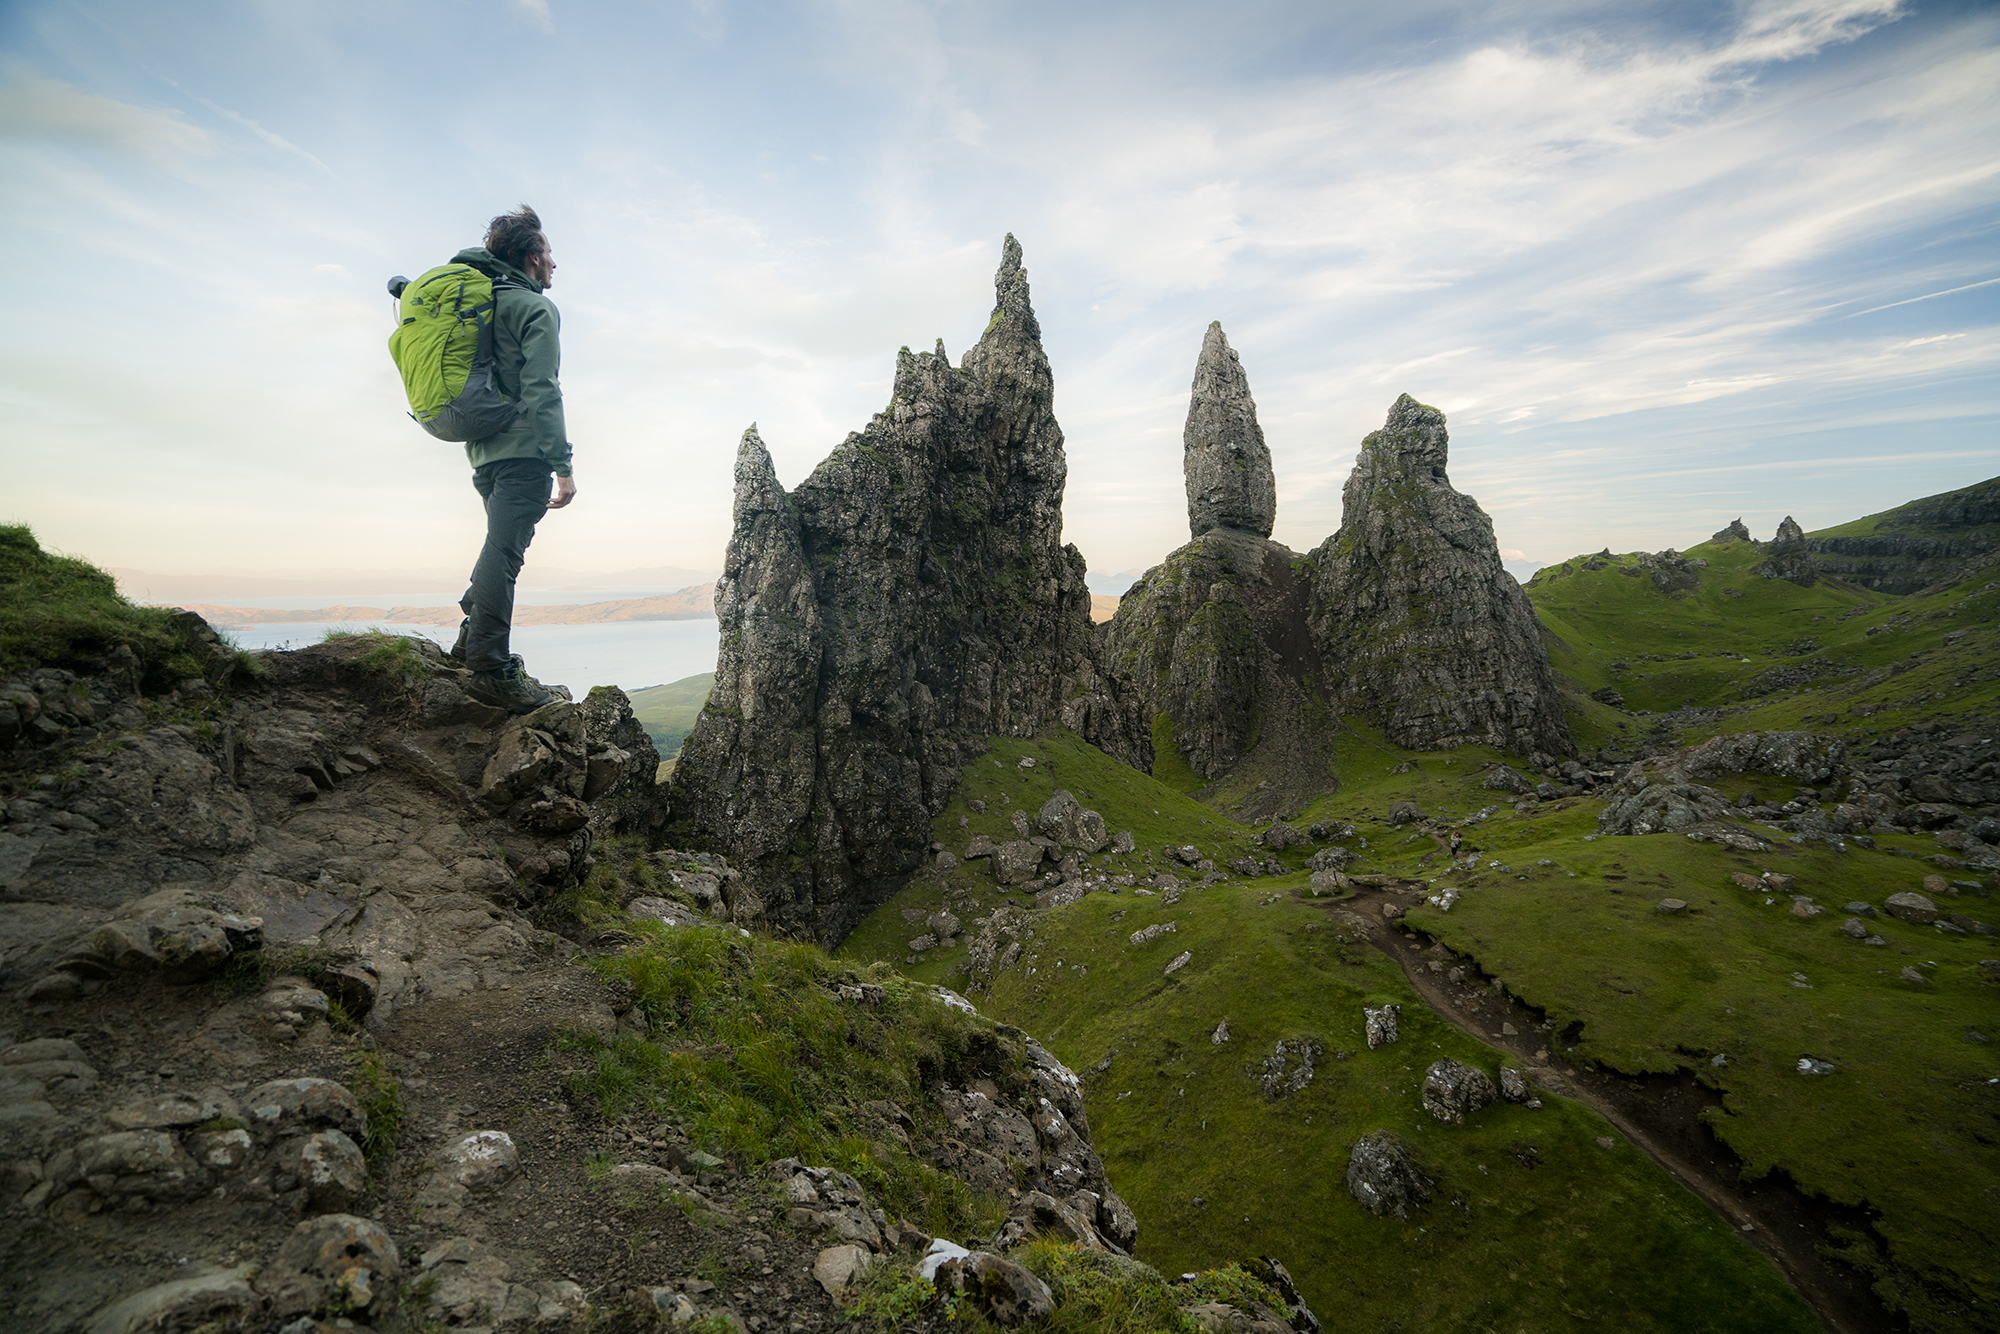 Daniel Woods. Isle Of Skye, Scotland. Photography by Chris Burkard.